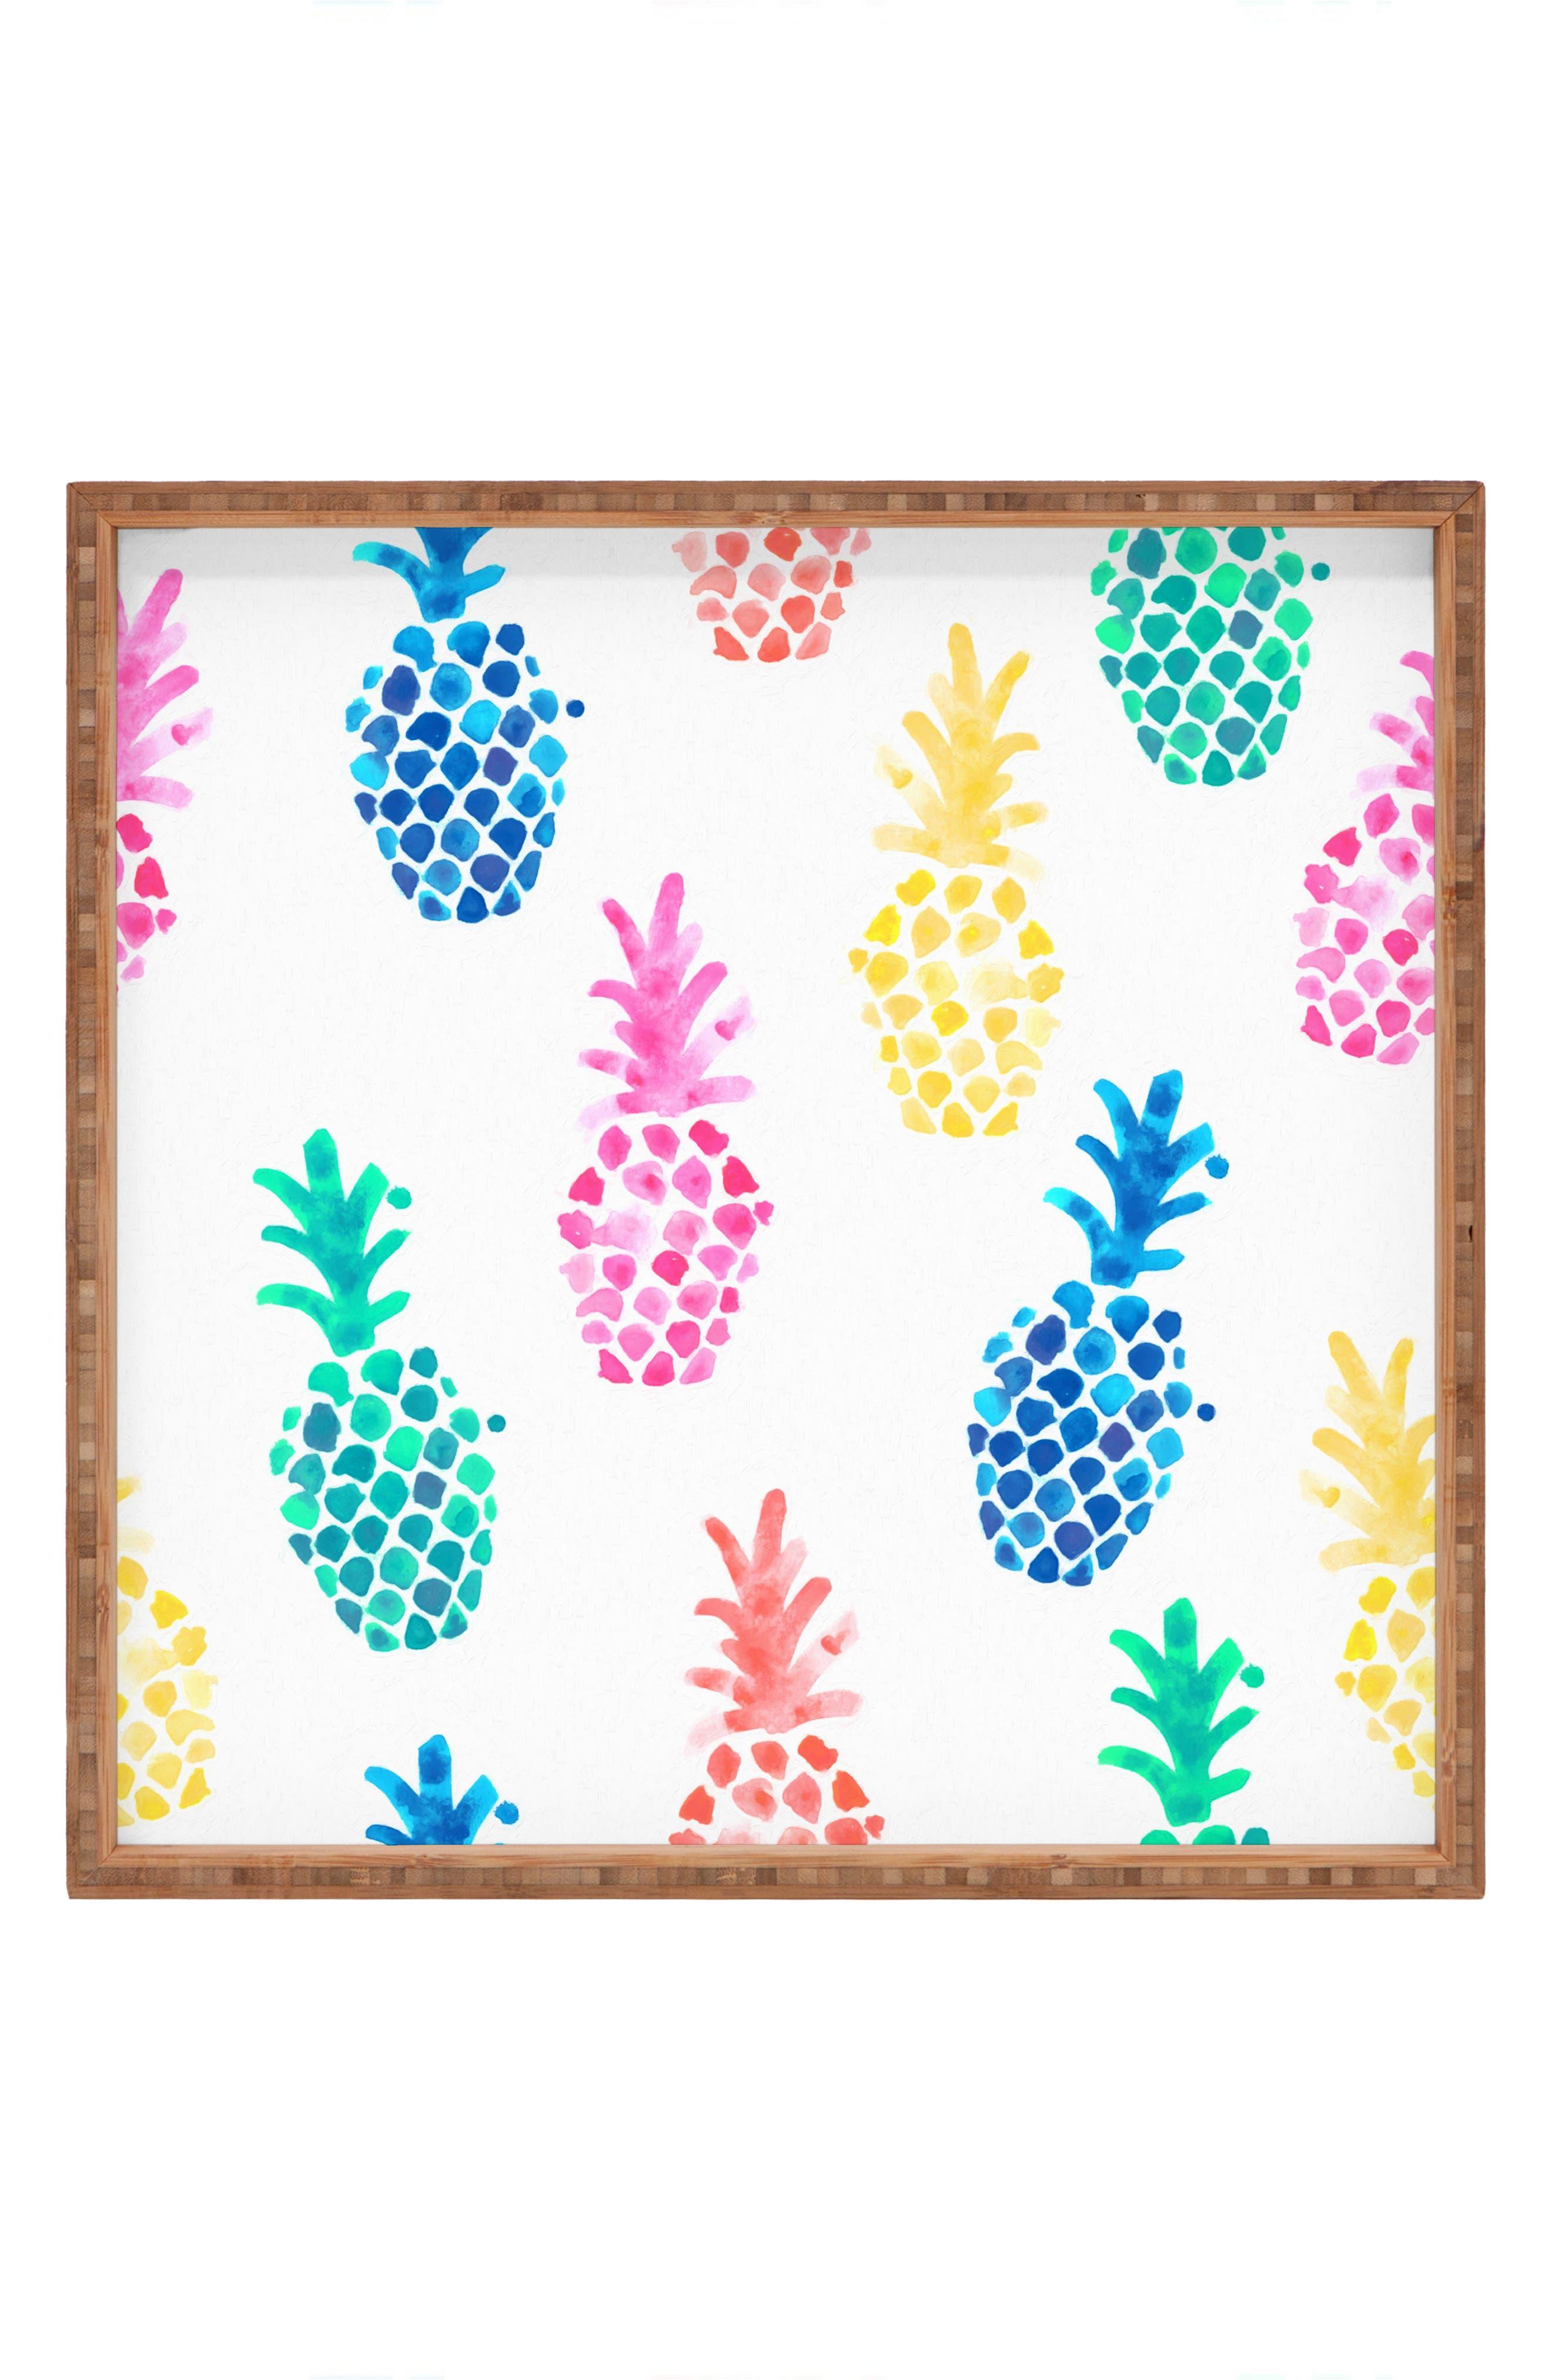 Dash & Ash - Pineapple Paradise Decorative Tray,                             Main thumbnail 1, color,                             700